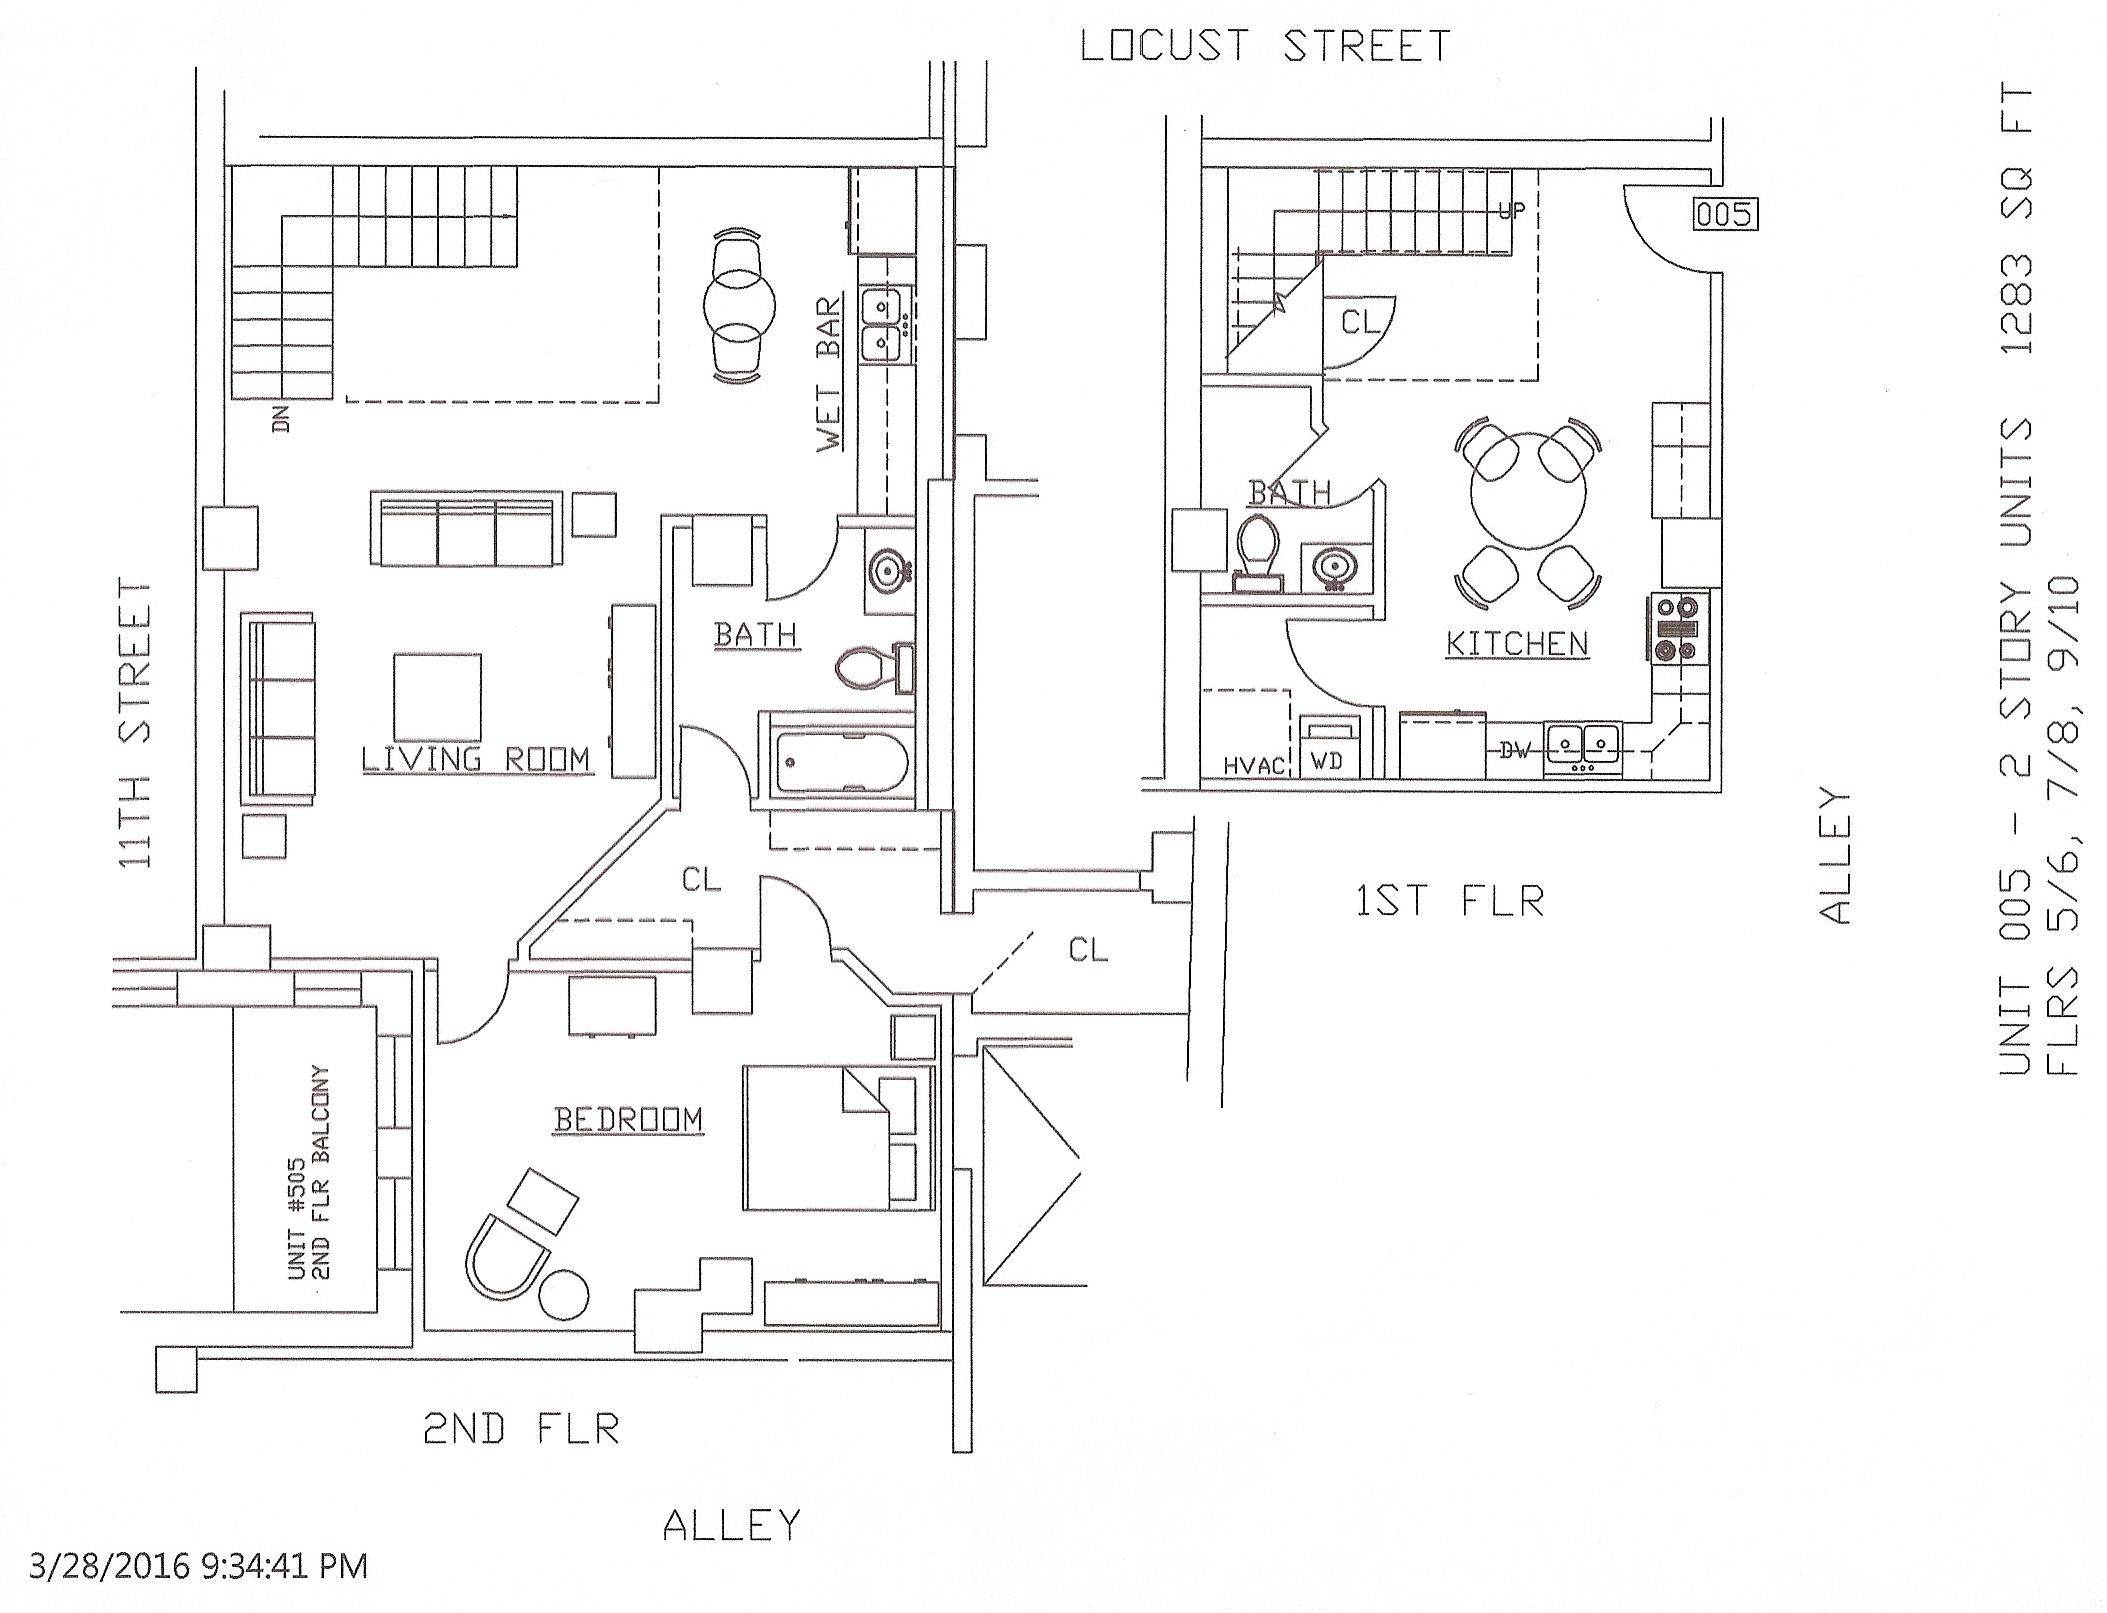 Unit 05, 1283 Square Feet